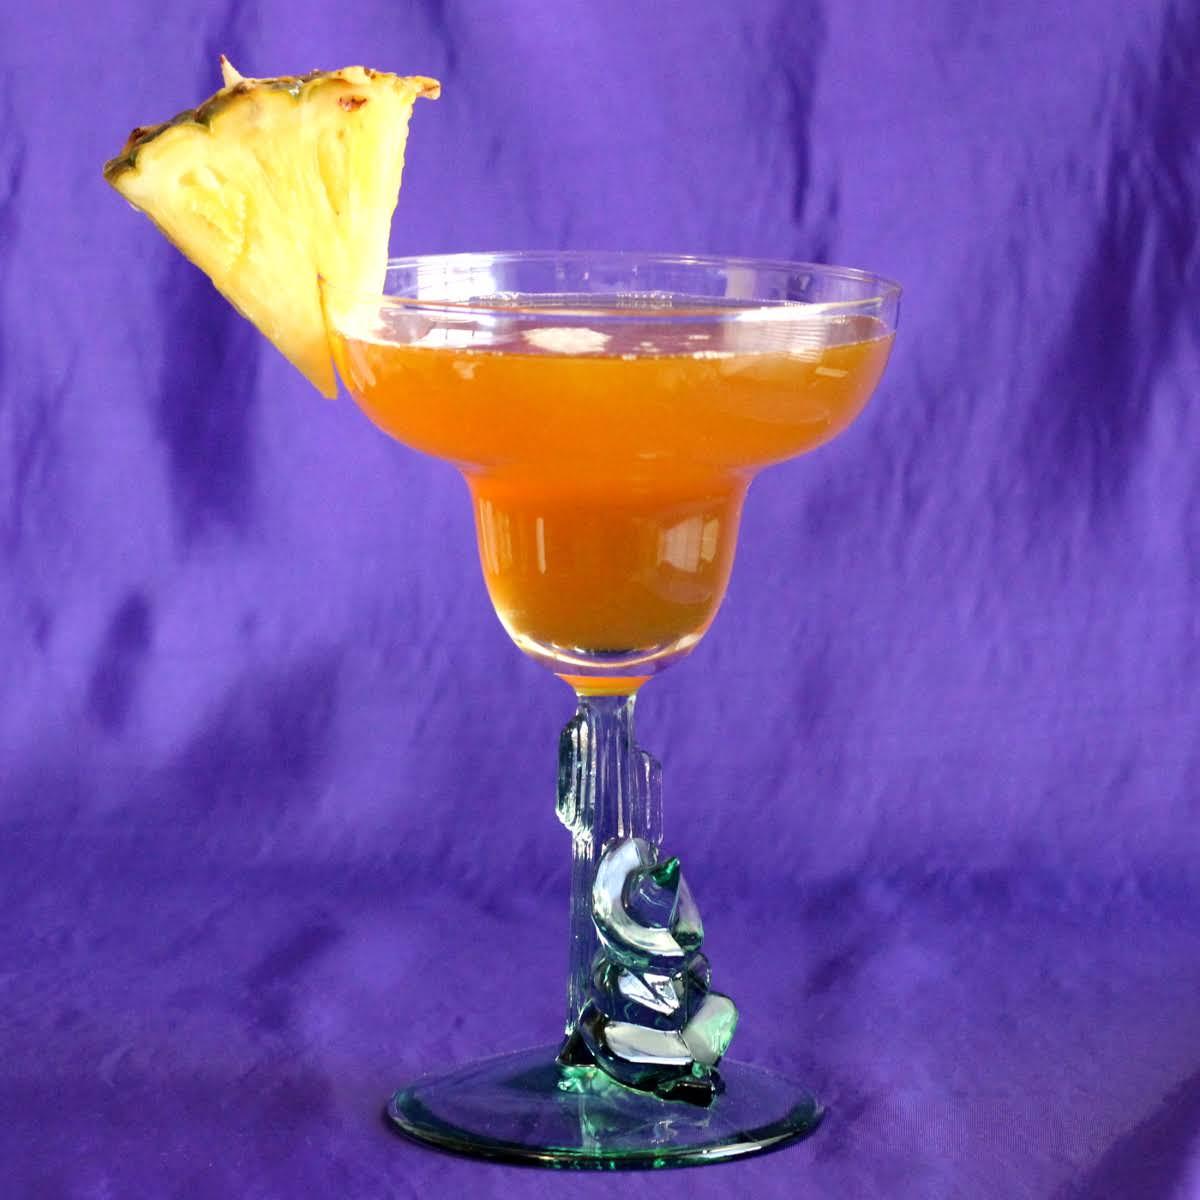 10 Best Cactus Juice Alcoholic Drink Recipes